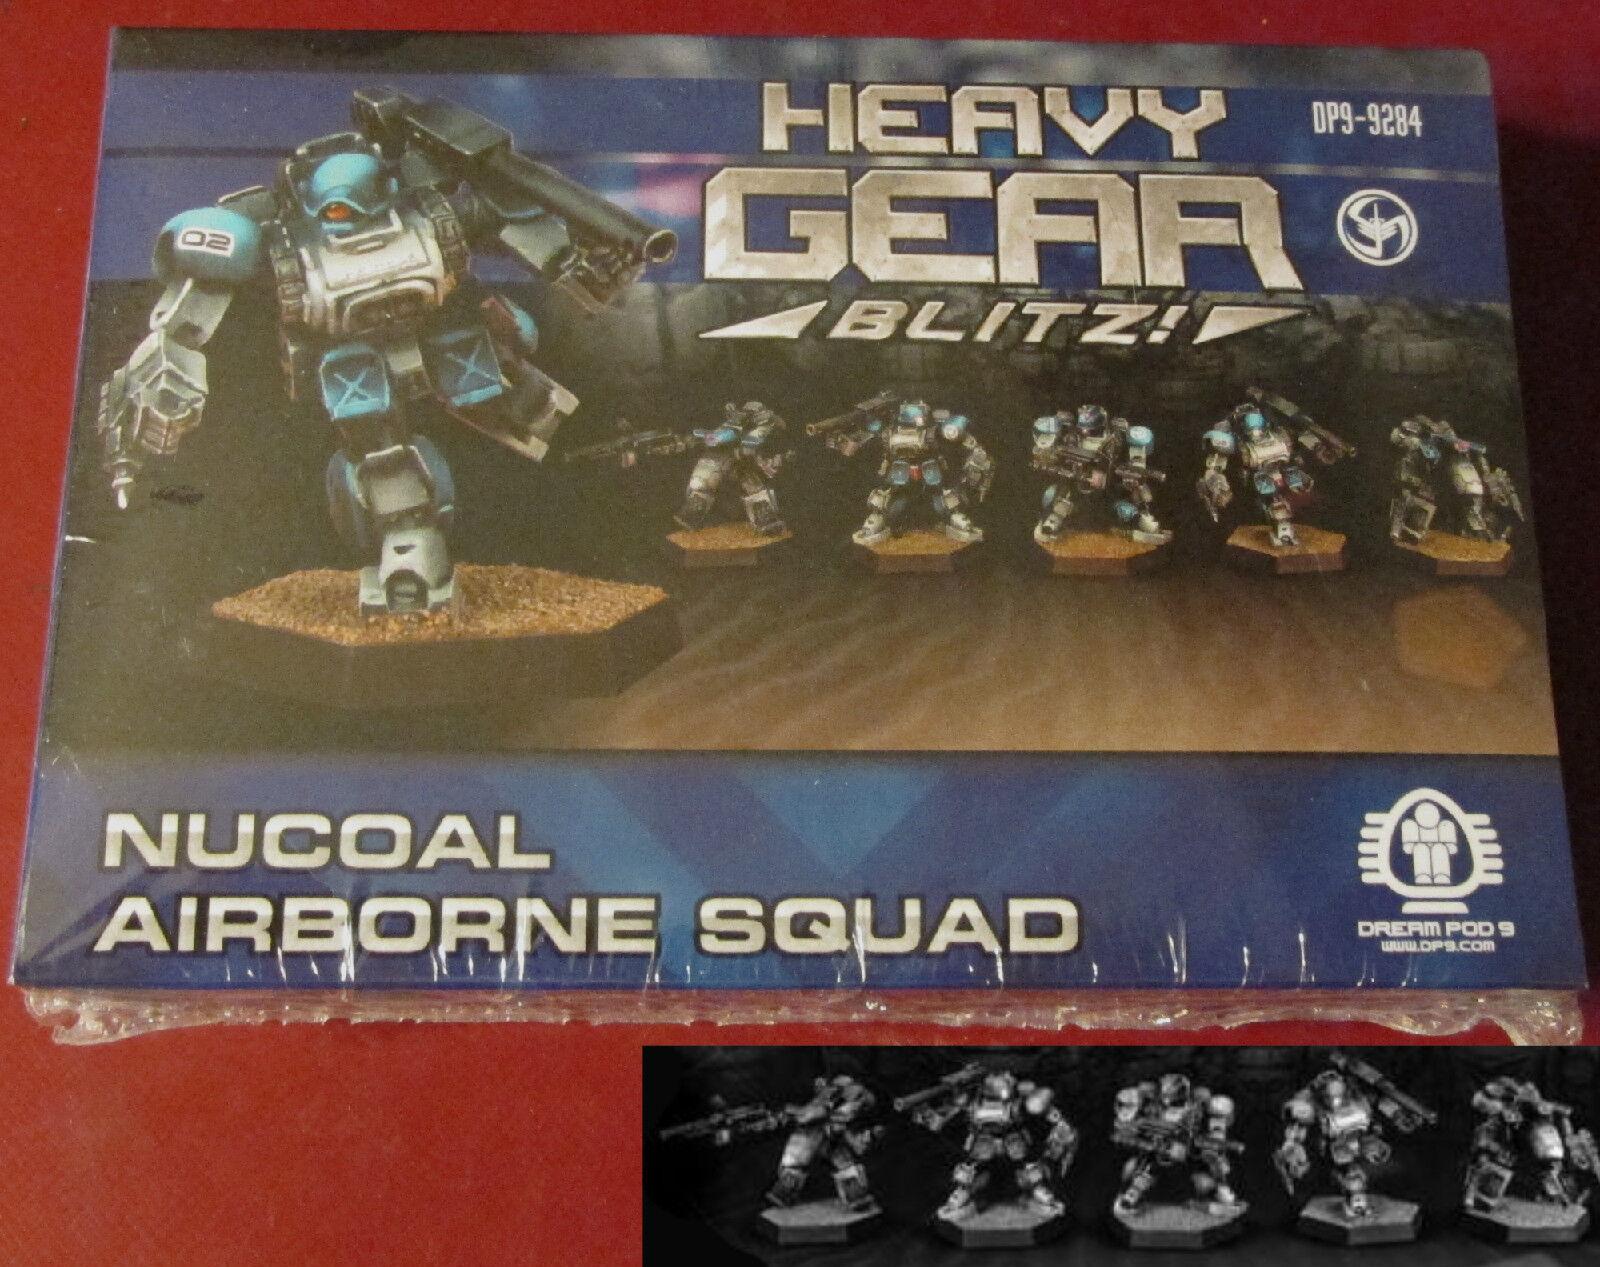 Heavy Gear Blitz DP9-9284 NuCoal Airborne Squad (5) Miniatures Paratrooper Gears